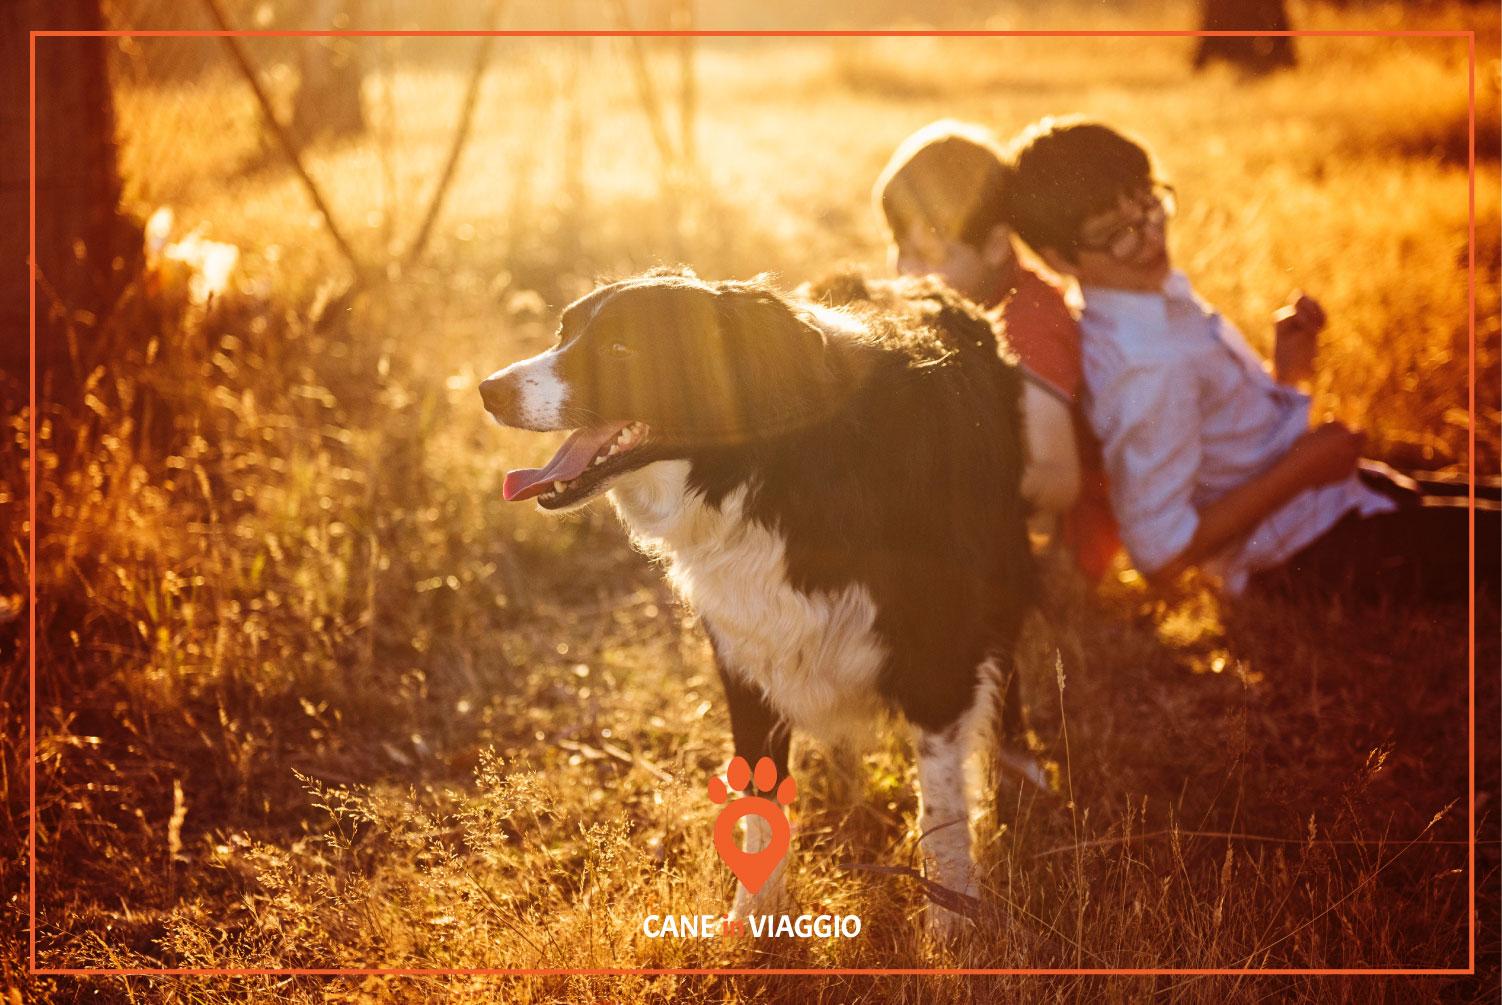 bambini giocano con un cane in un agriturismo